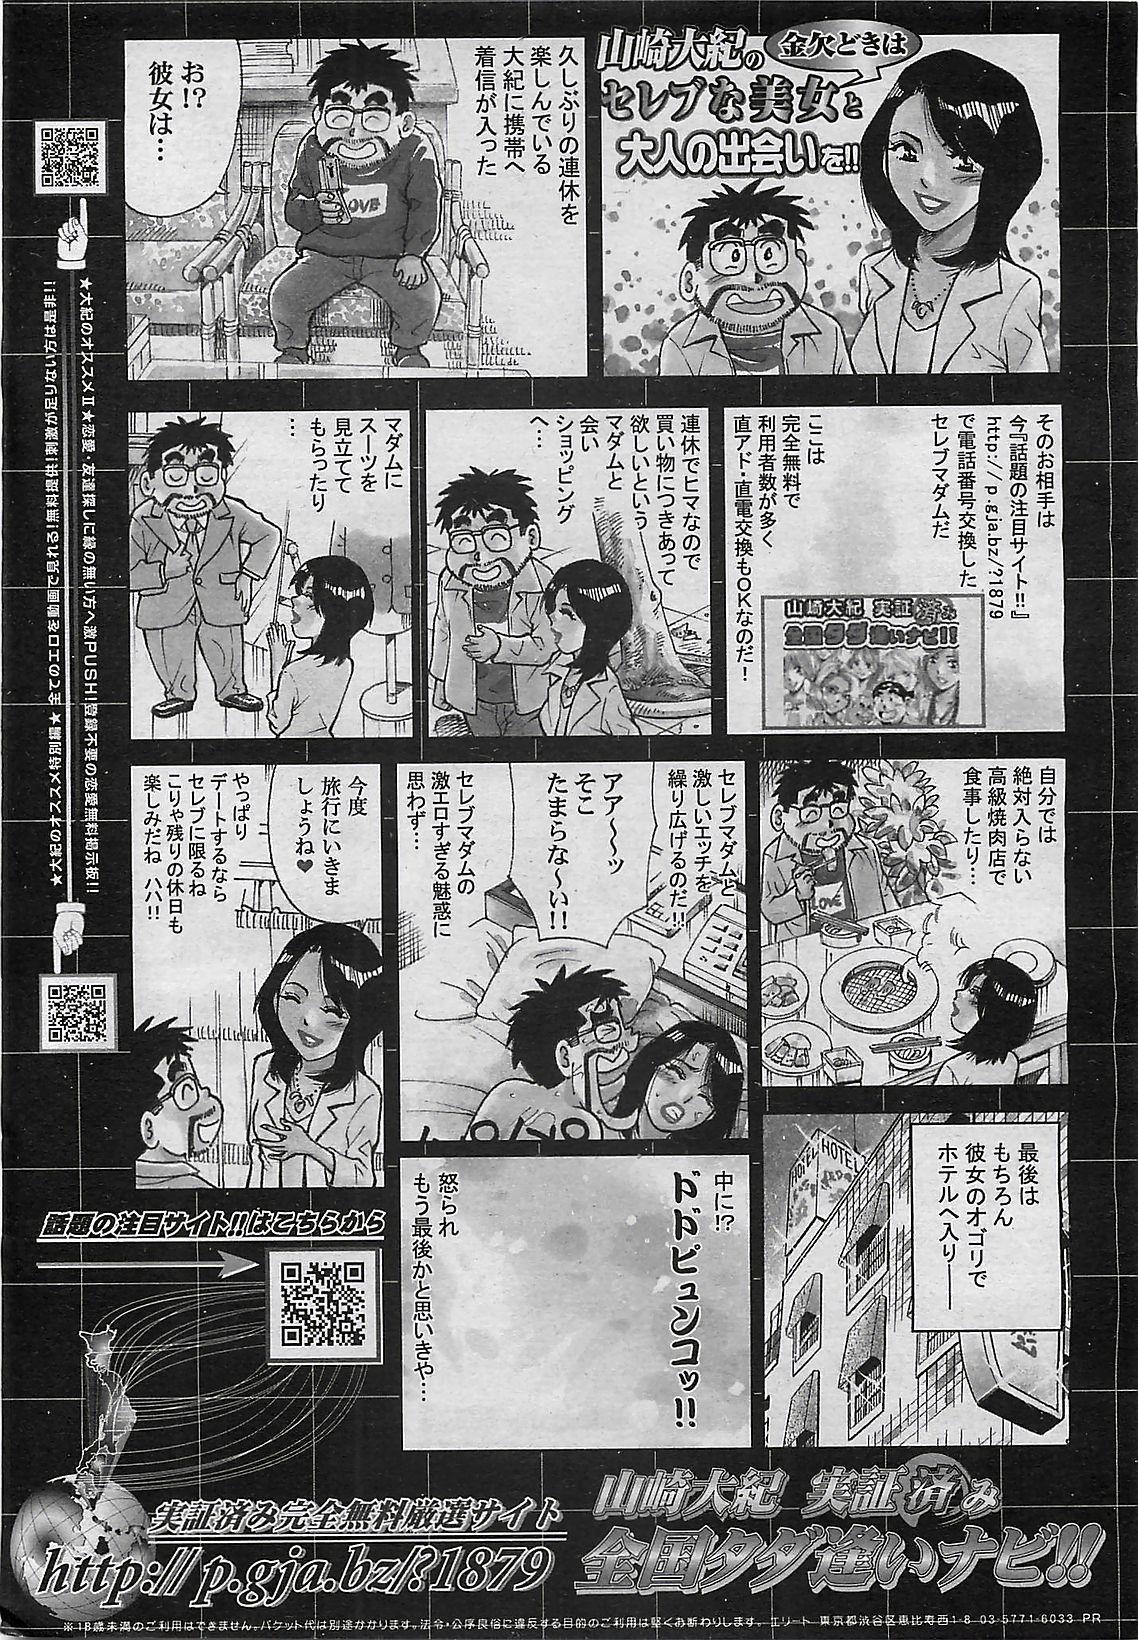 COMIC Penguin Club Sanzokuban 2007-03 245